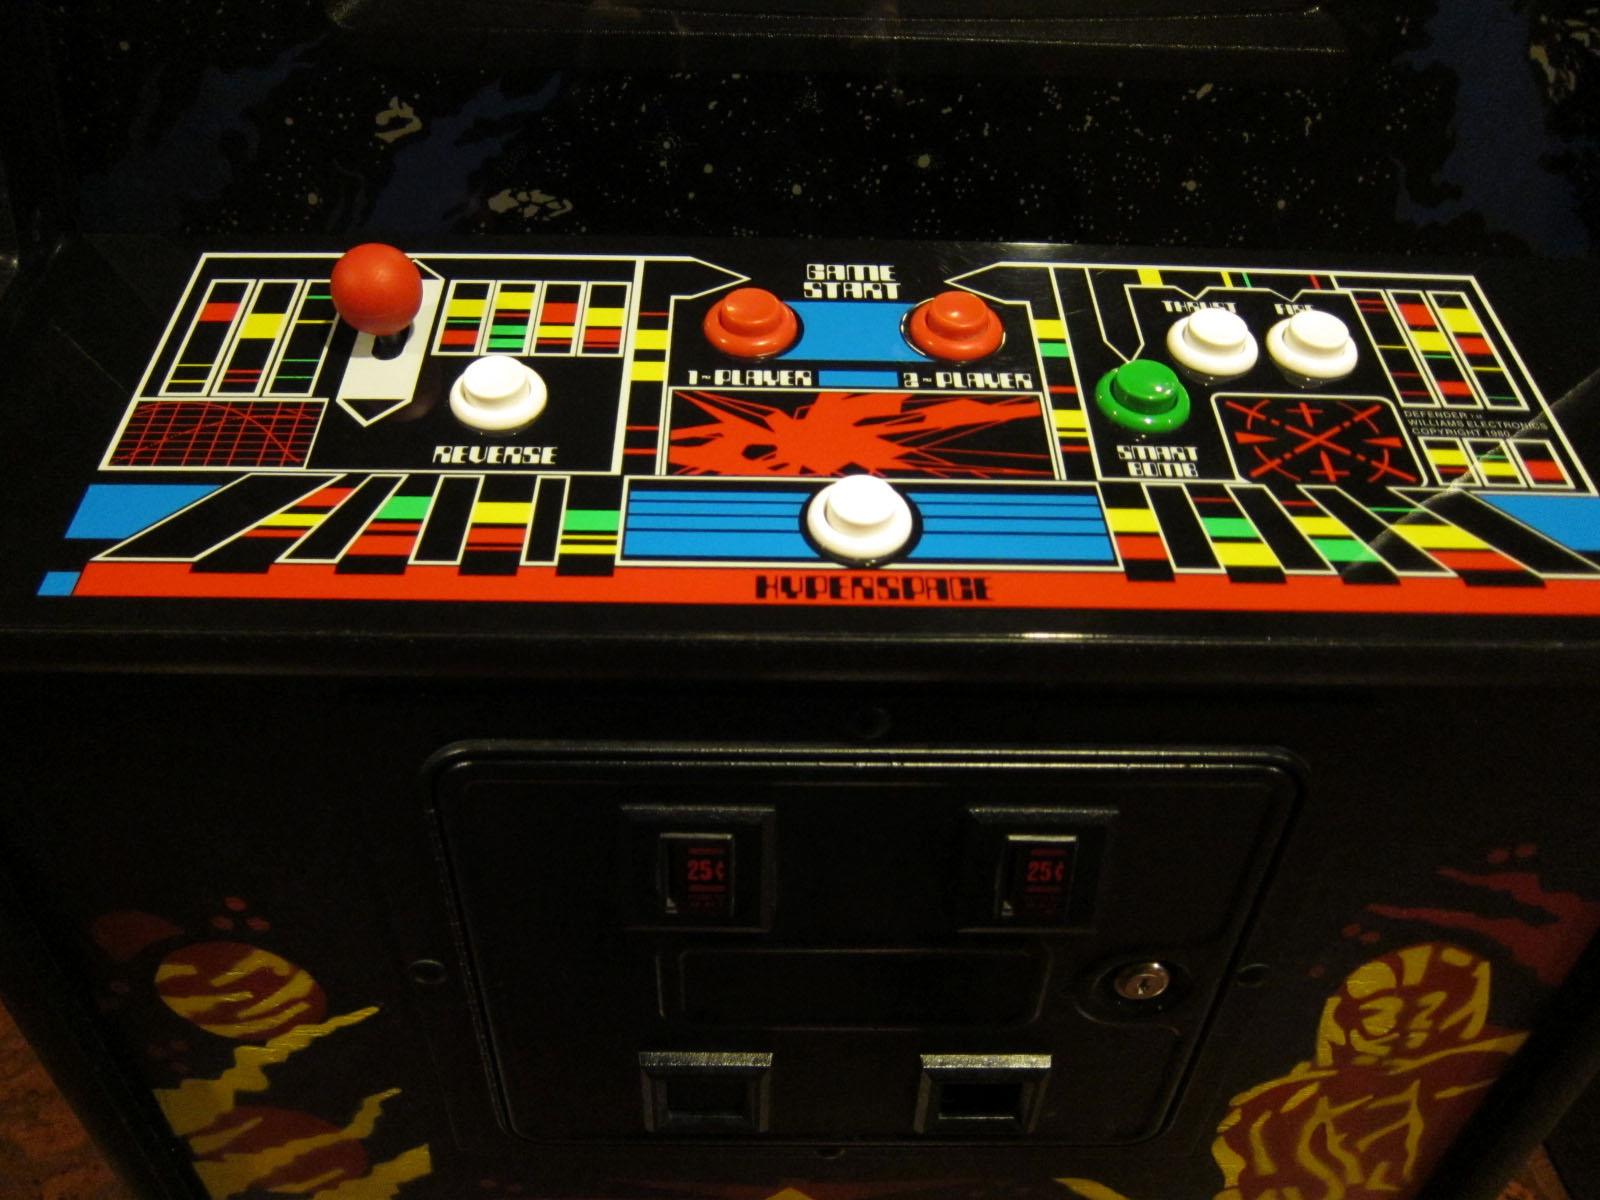 Home Bar And Game Room : 2011 Defender 04 from buildinghomebar.com size 1600 x 1200 jpeg 240kB